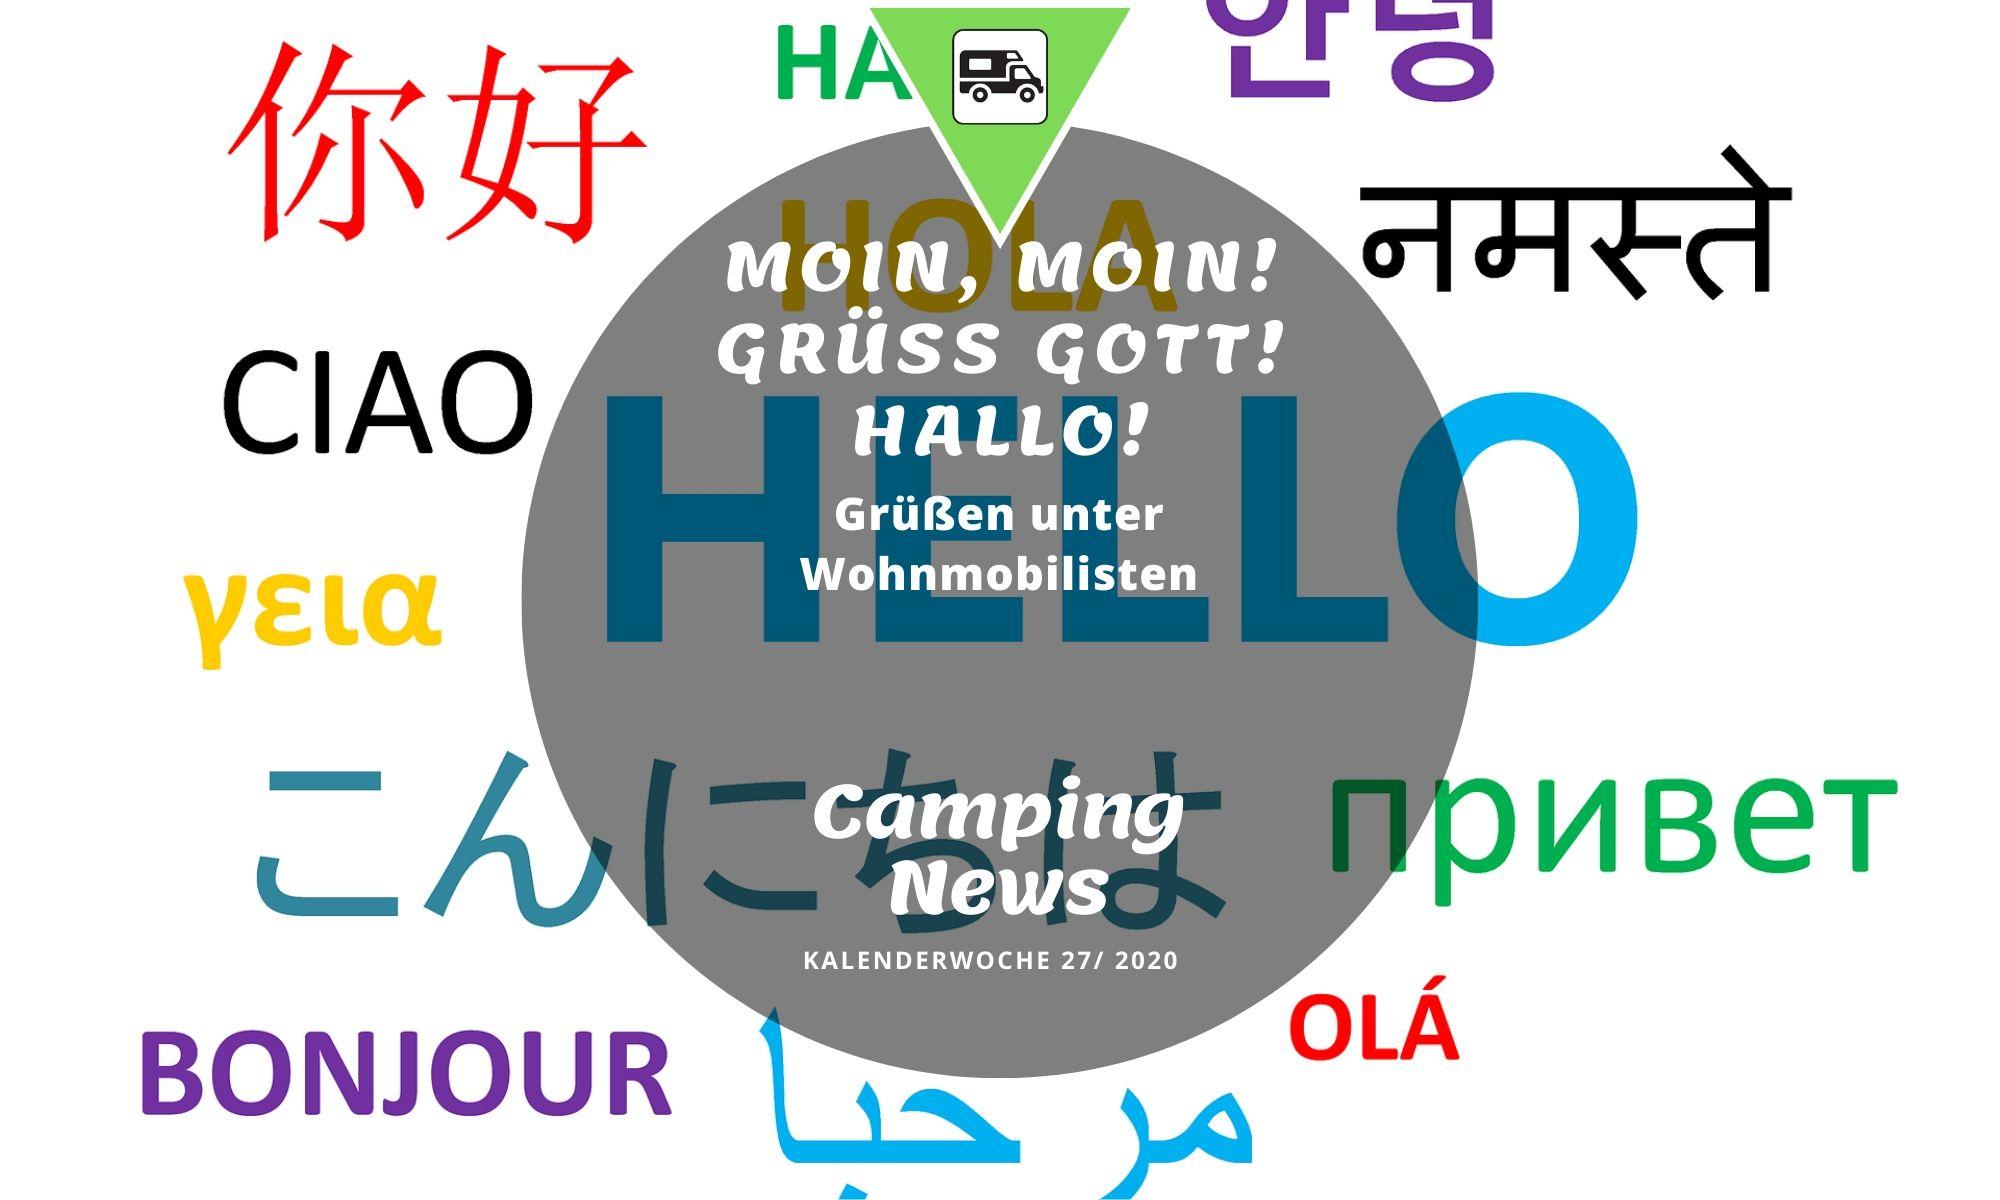 Wochenrückblick Camping News KW27-2020